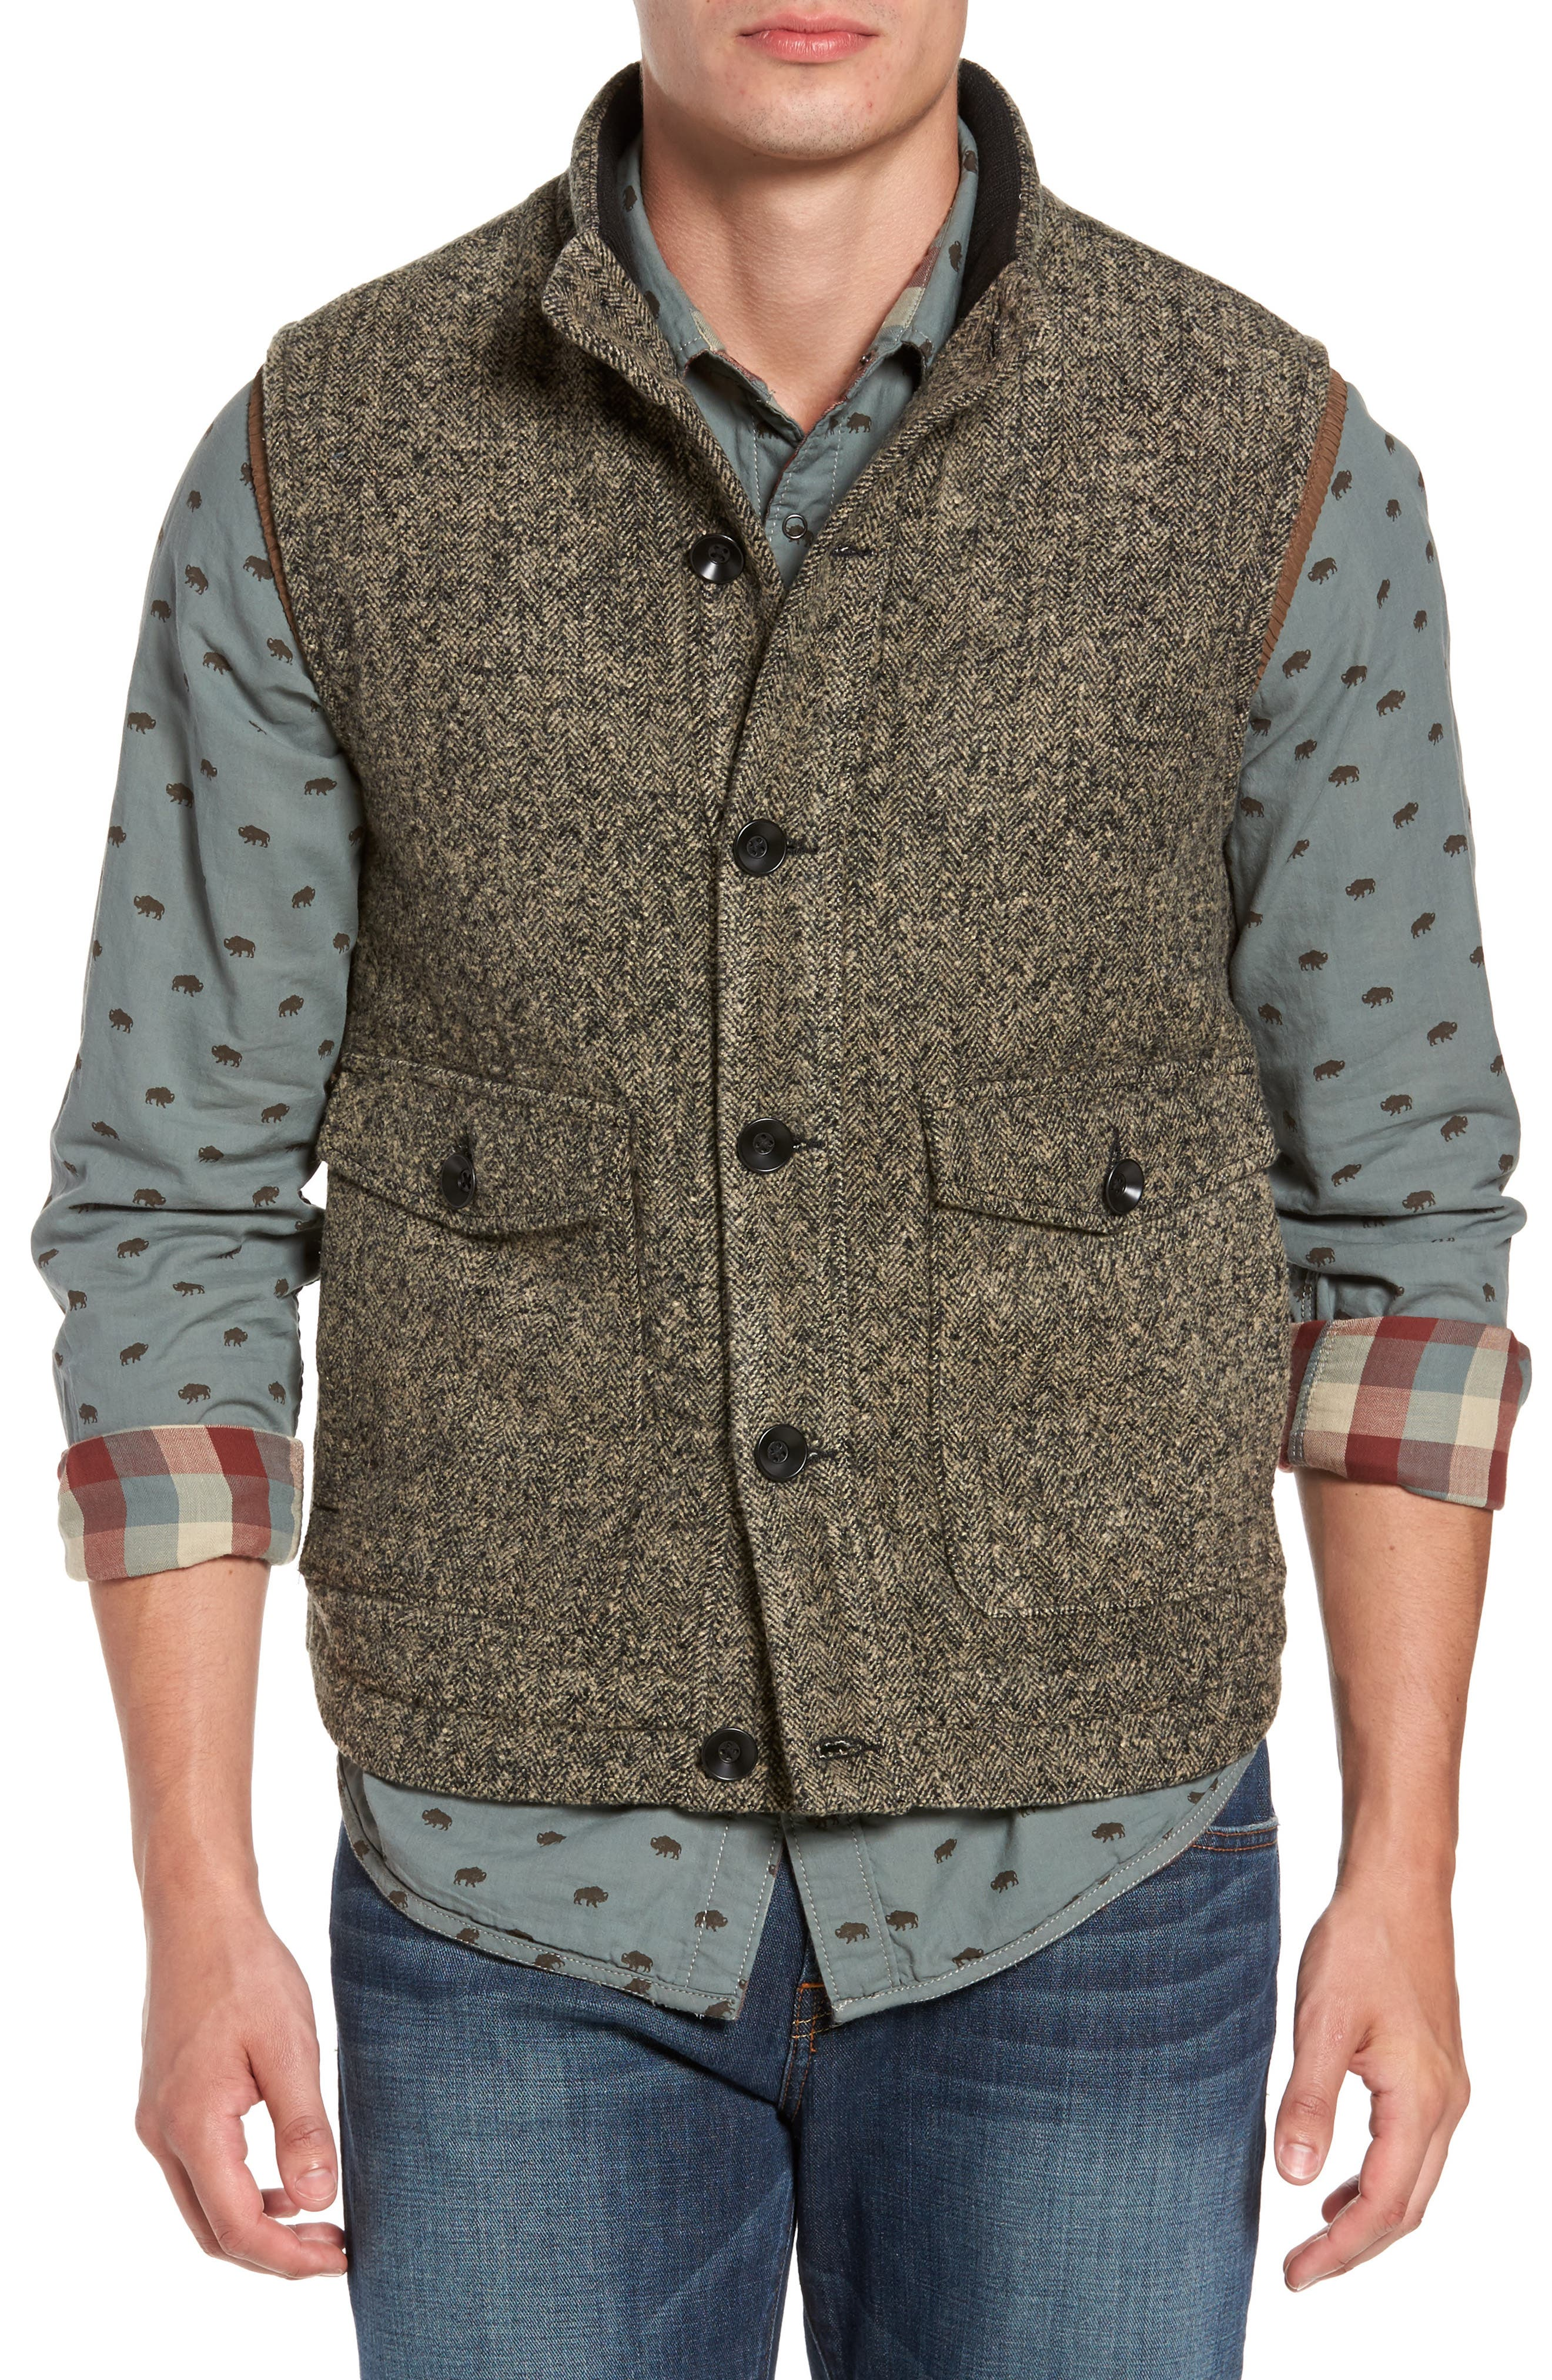 Sanford Herringbone Vest,                             Main thumbnail 1, color,                             200